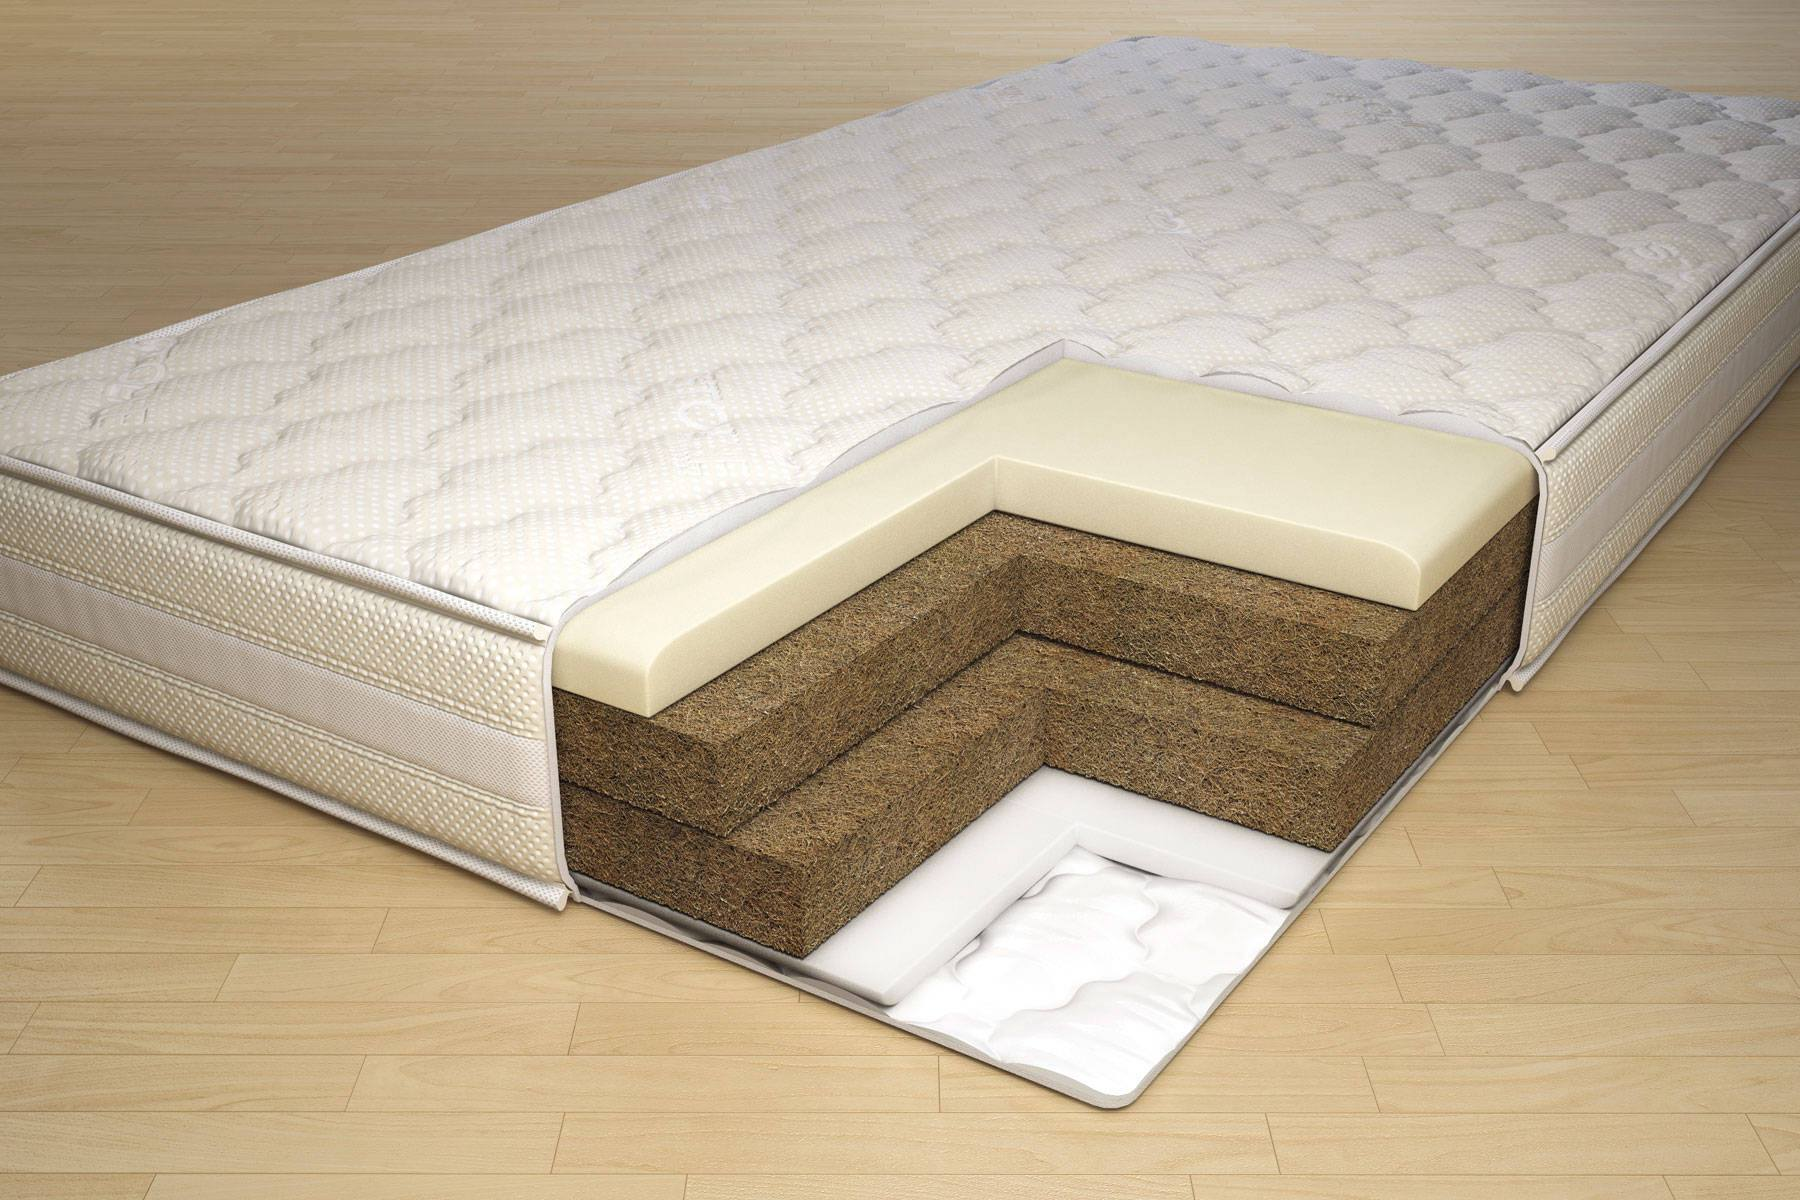 диван от производителя уфа